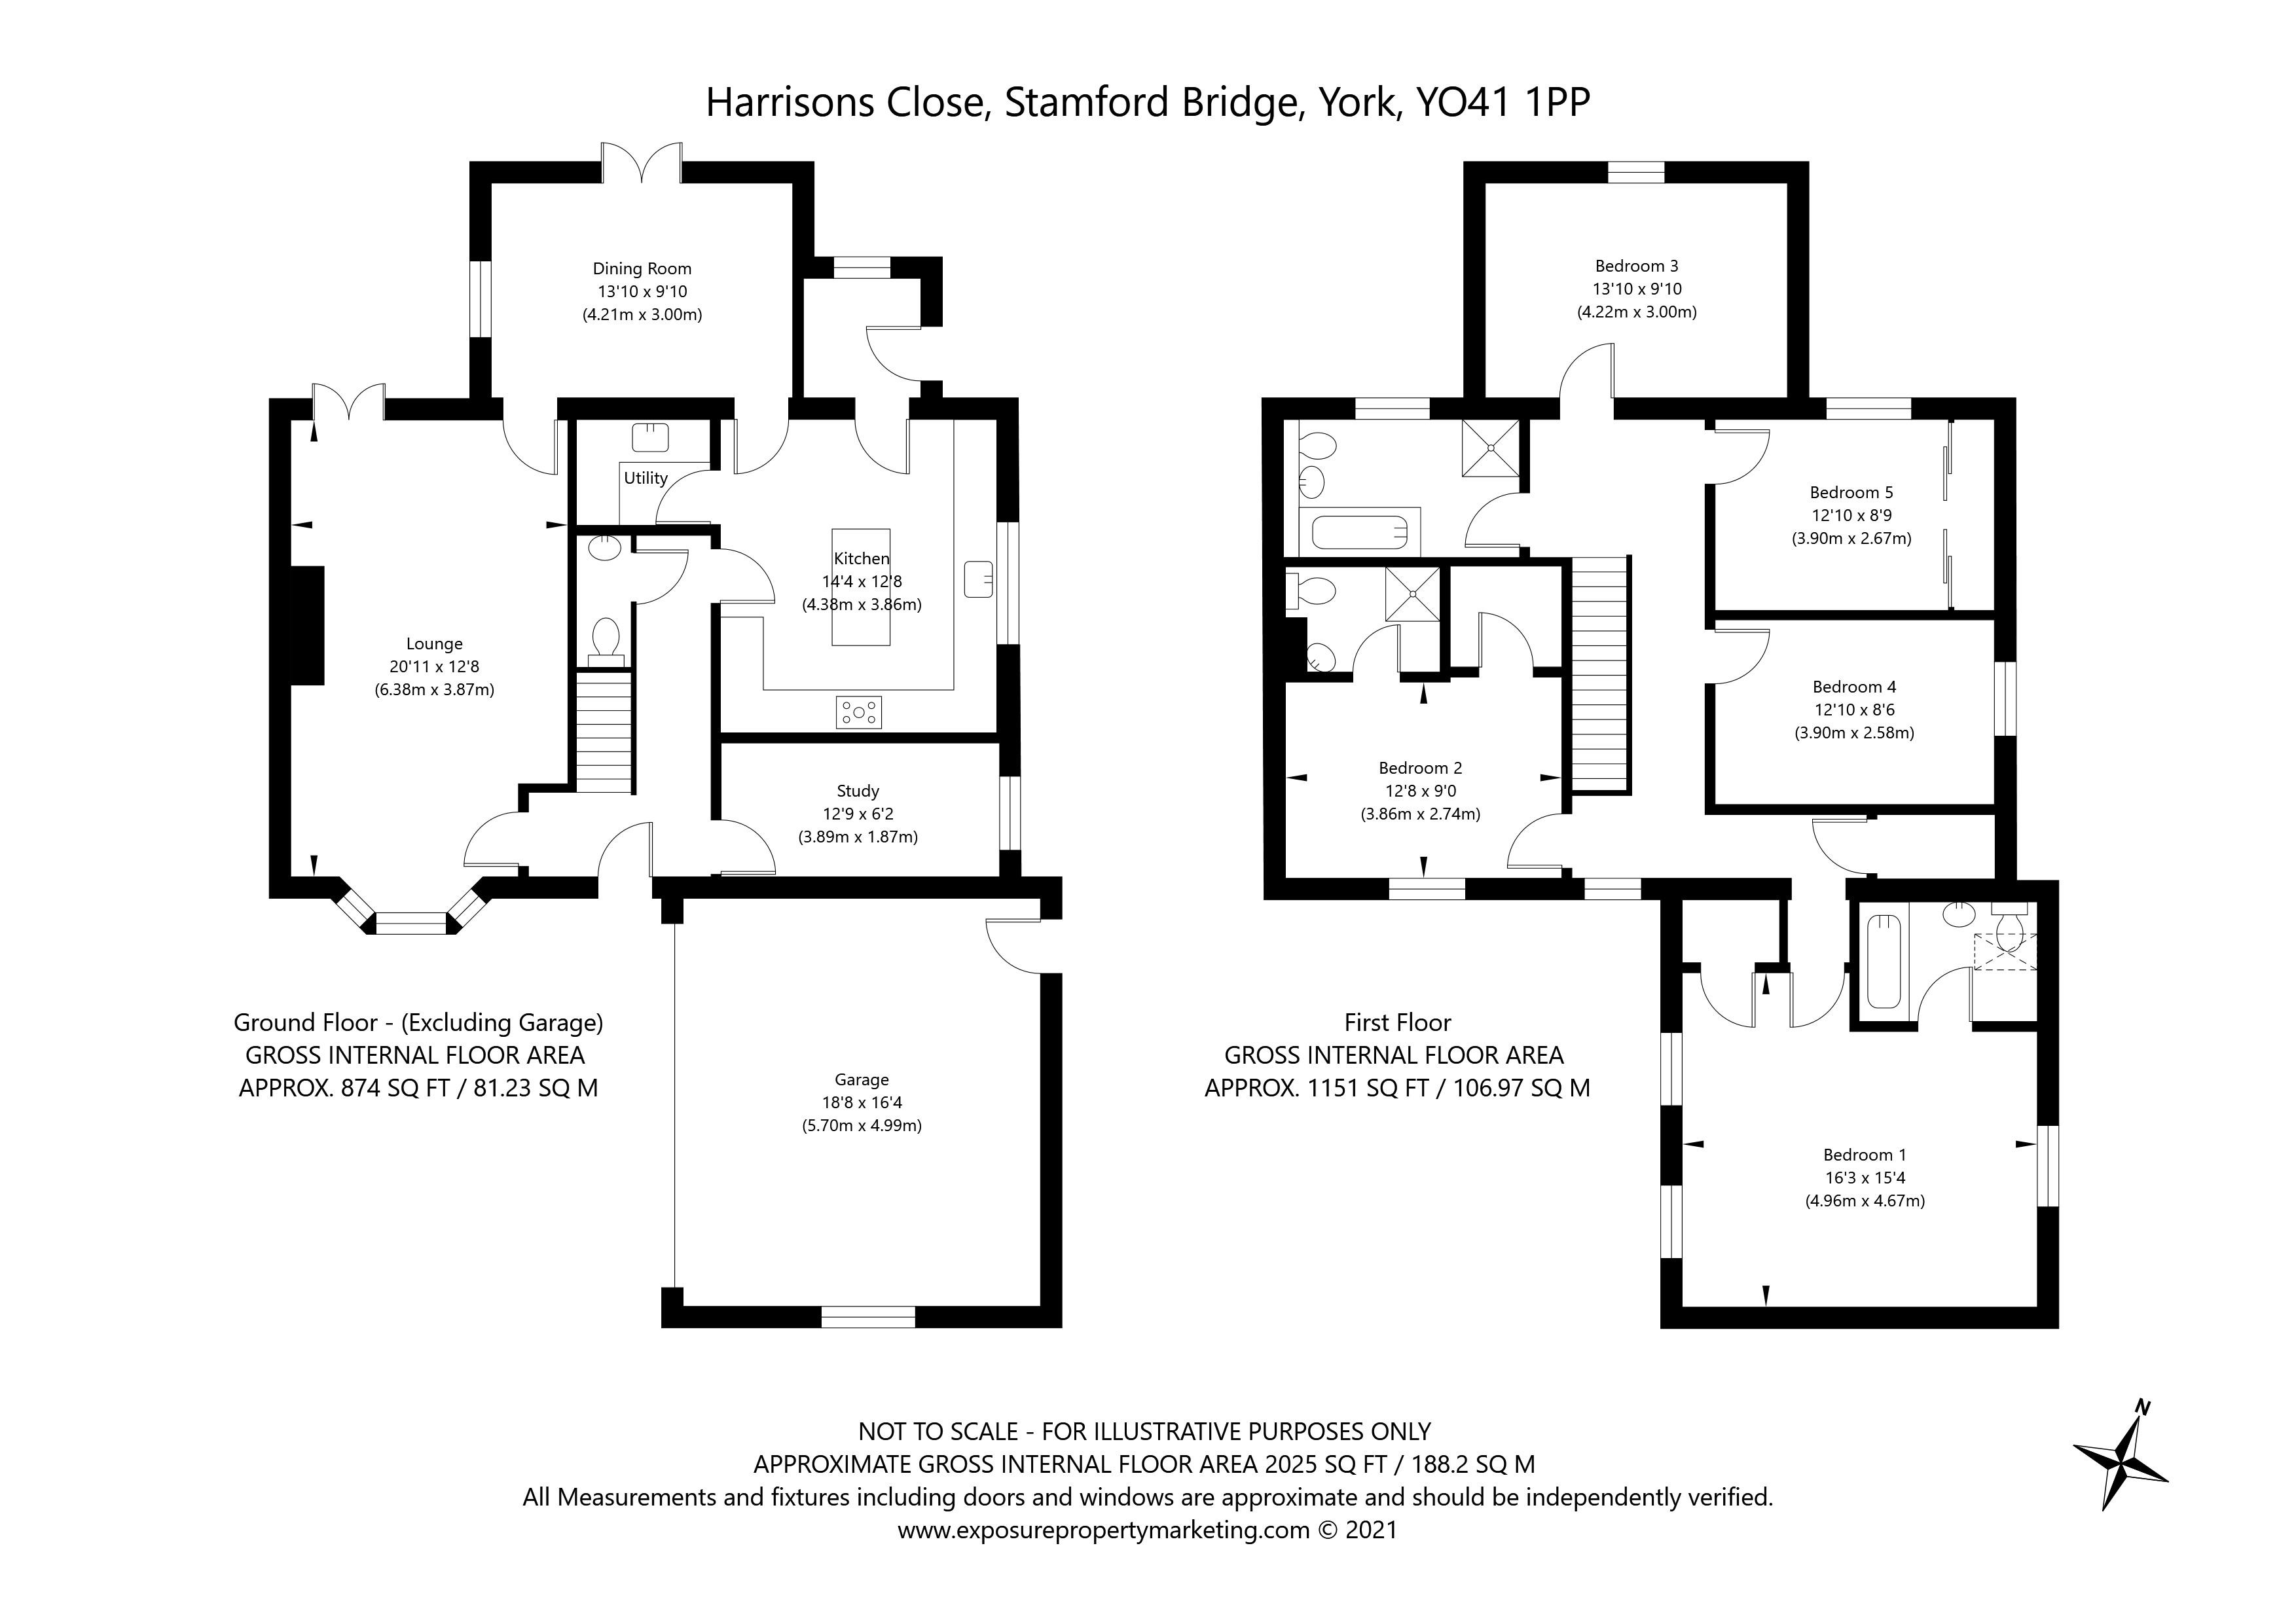 Harrisons Close, Stamford Bridge, York property floorplan